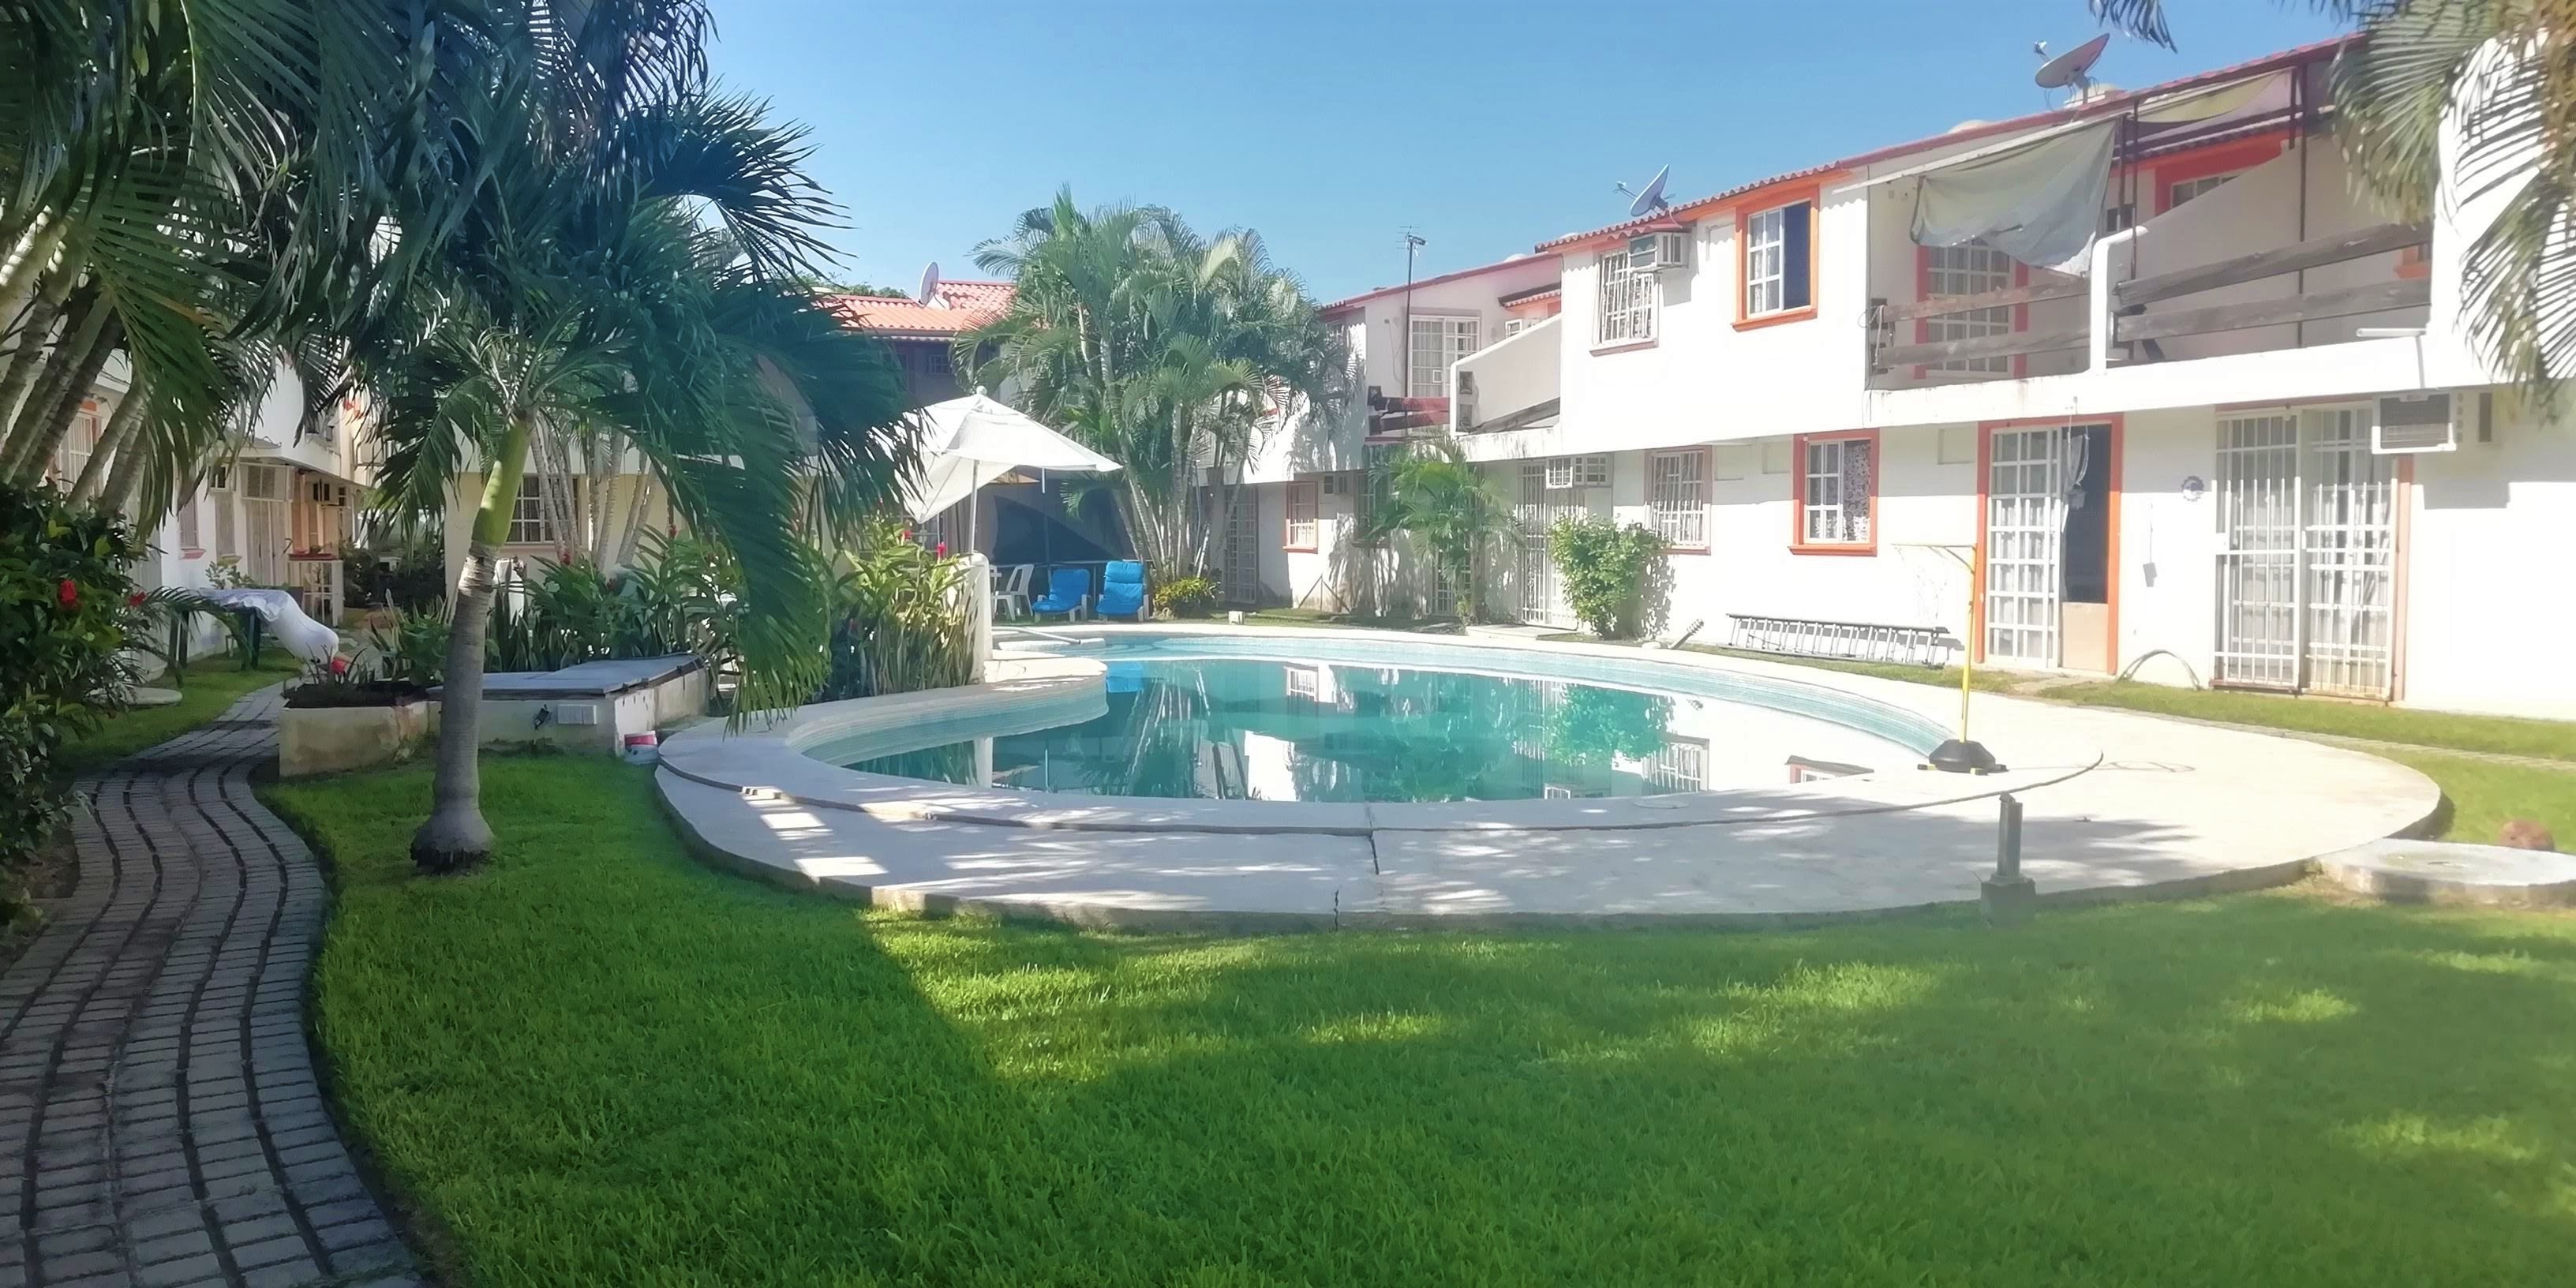 Remato Casa con alberca en Fracc. Marquesa. Acapulco.